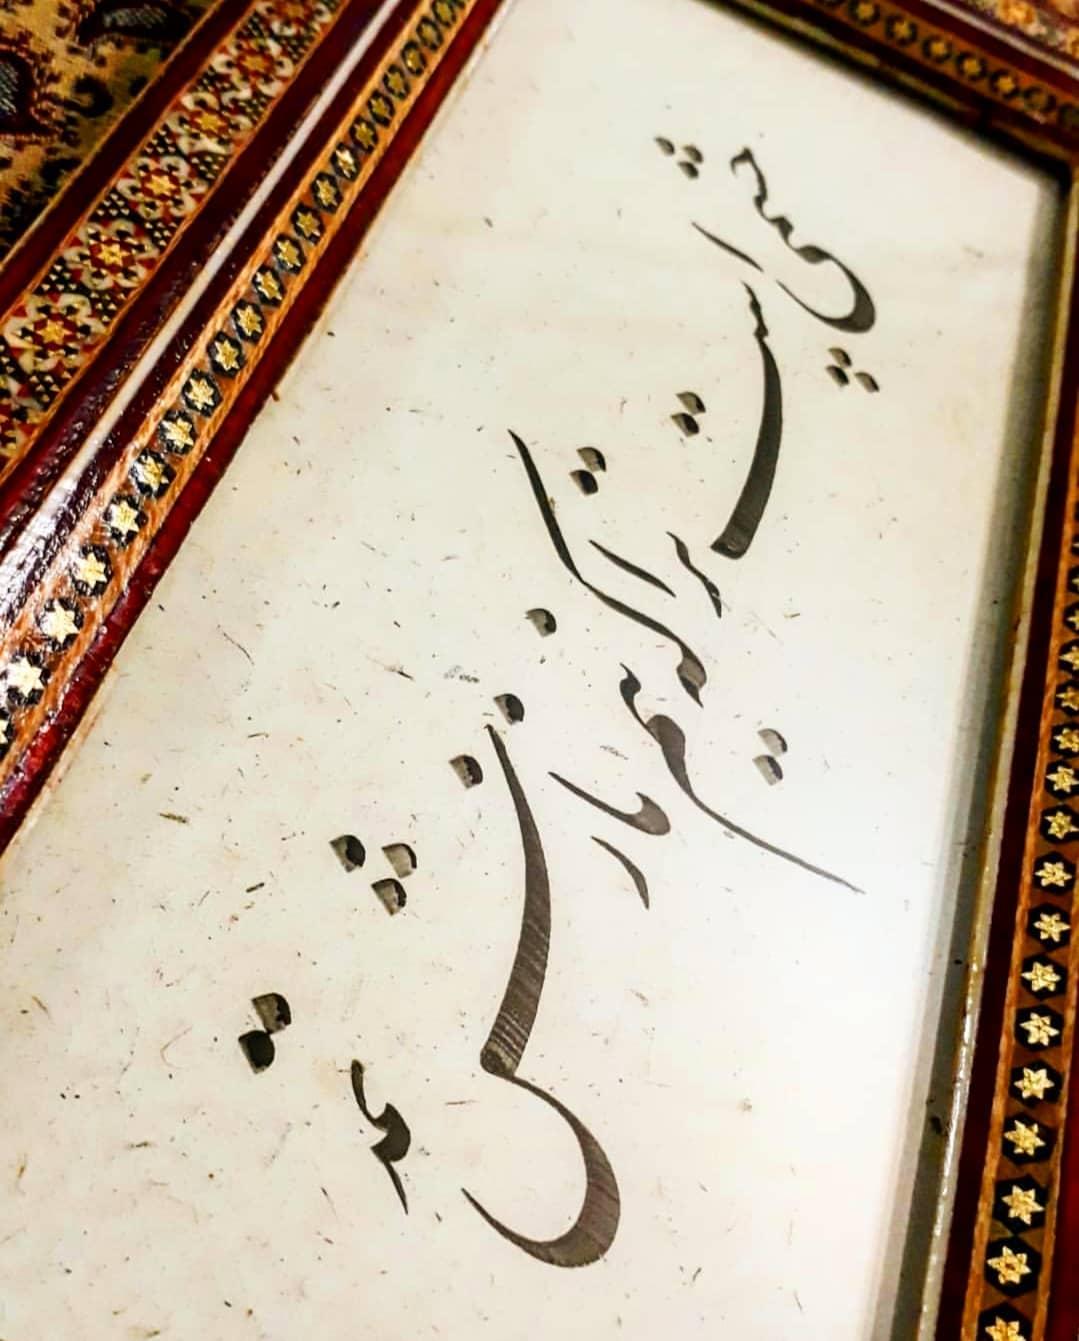 Farisi/Nasta'liq khatestan  ﷽ چشمی است تُرا که نیم نازش در حوصله جهان نگنجد  . #خطستان  @khatestan #خط_خودک… 1113